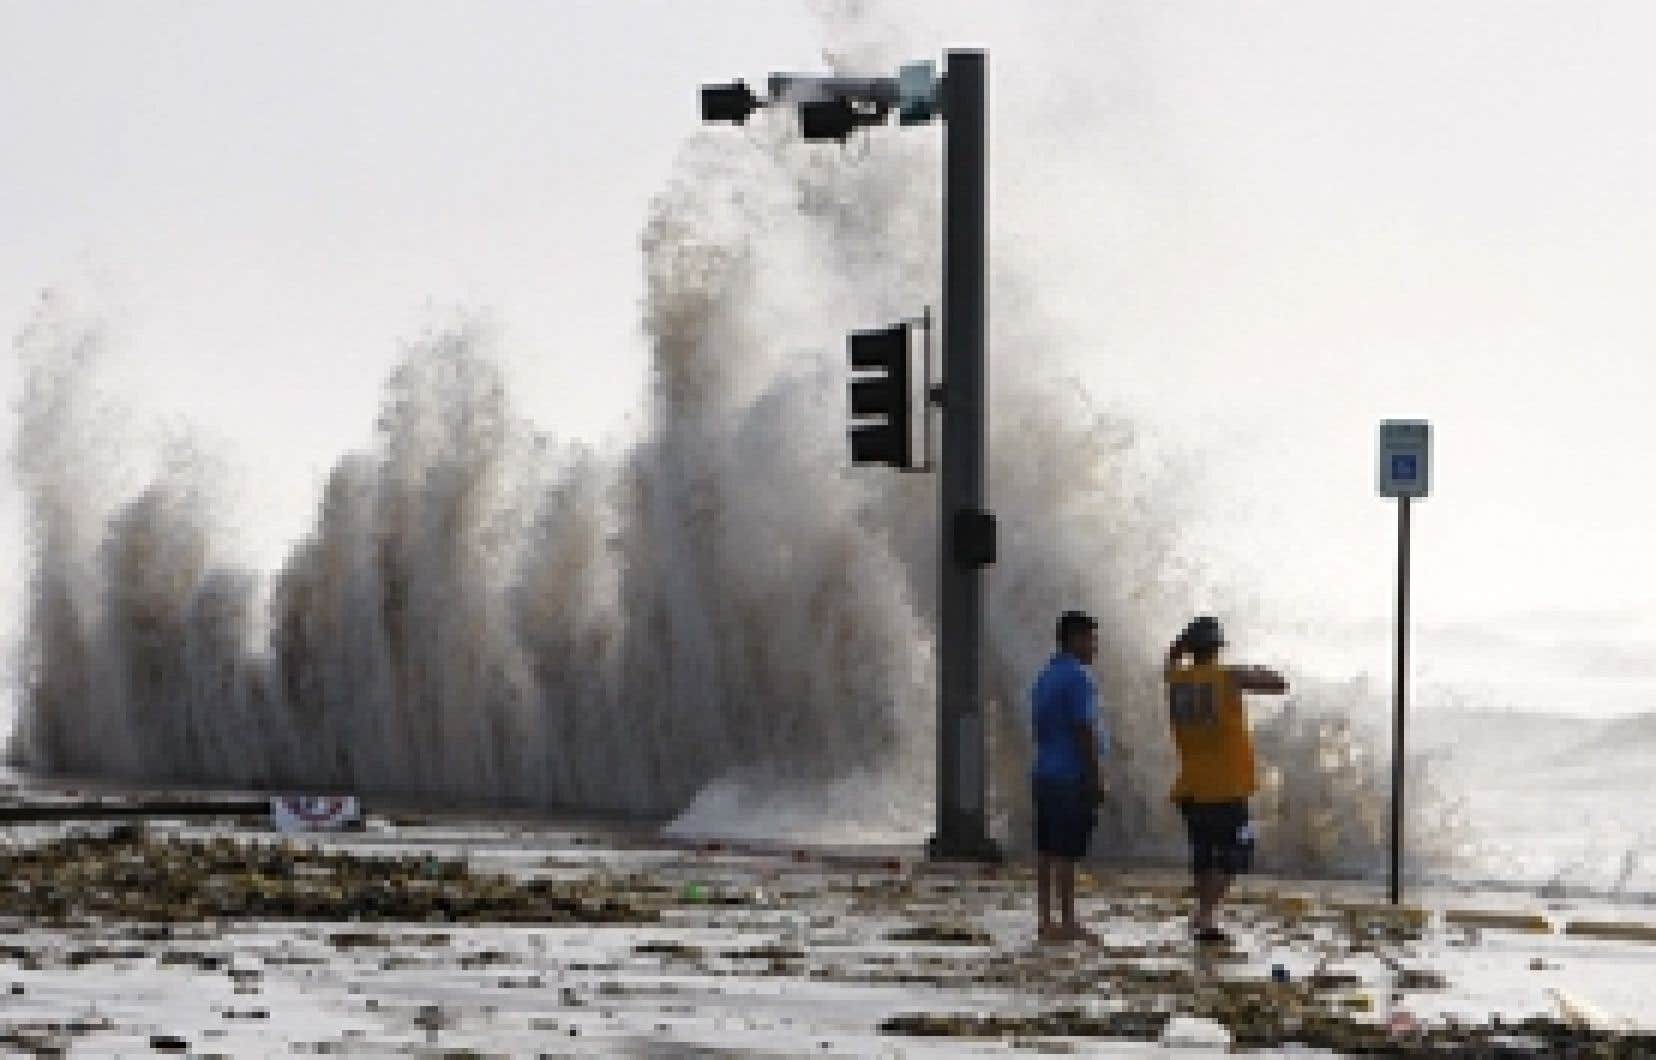 Des citoyens de Galveston, au Texas, observant l'océan en fureur, hier après-midi.